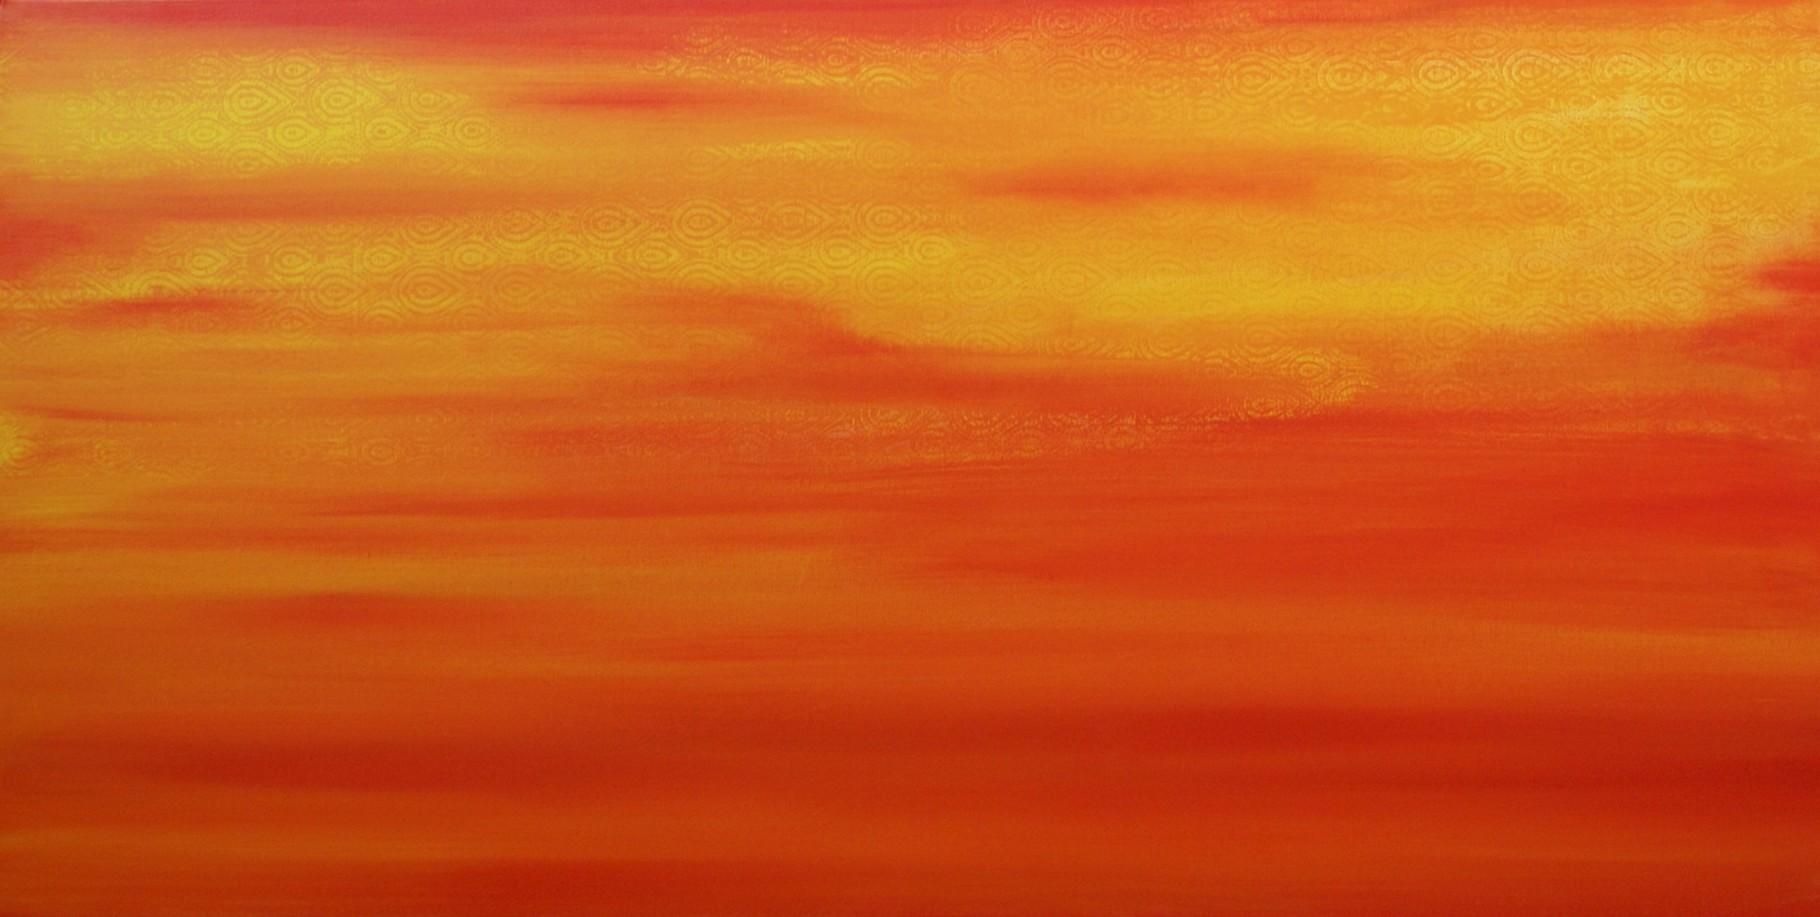 Morgenland - 50 x 100  - Acryl auf Leinwand - verkauft